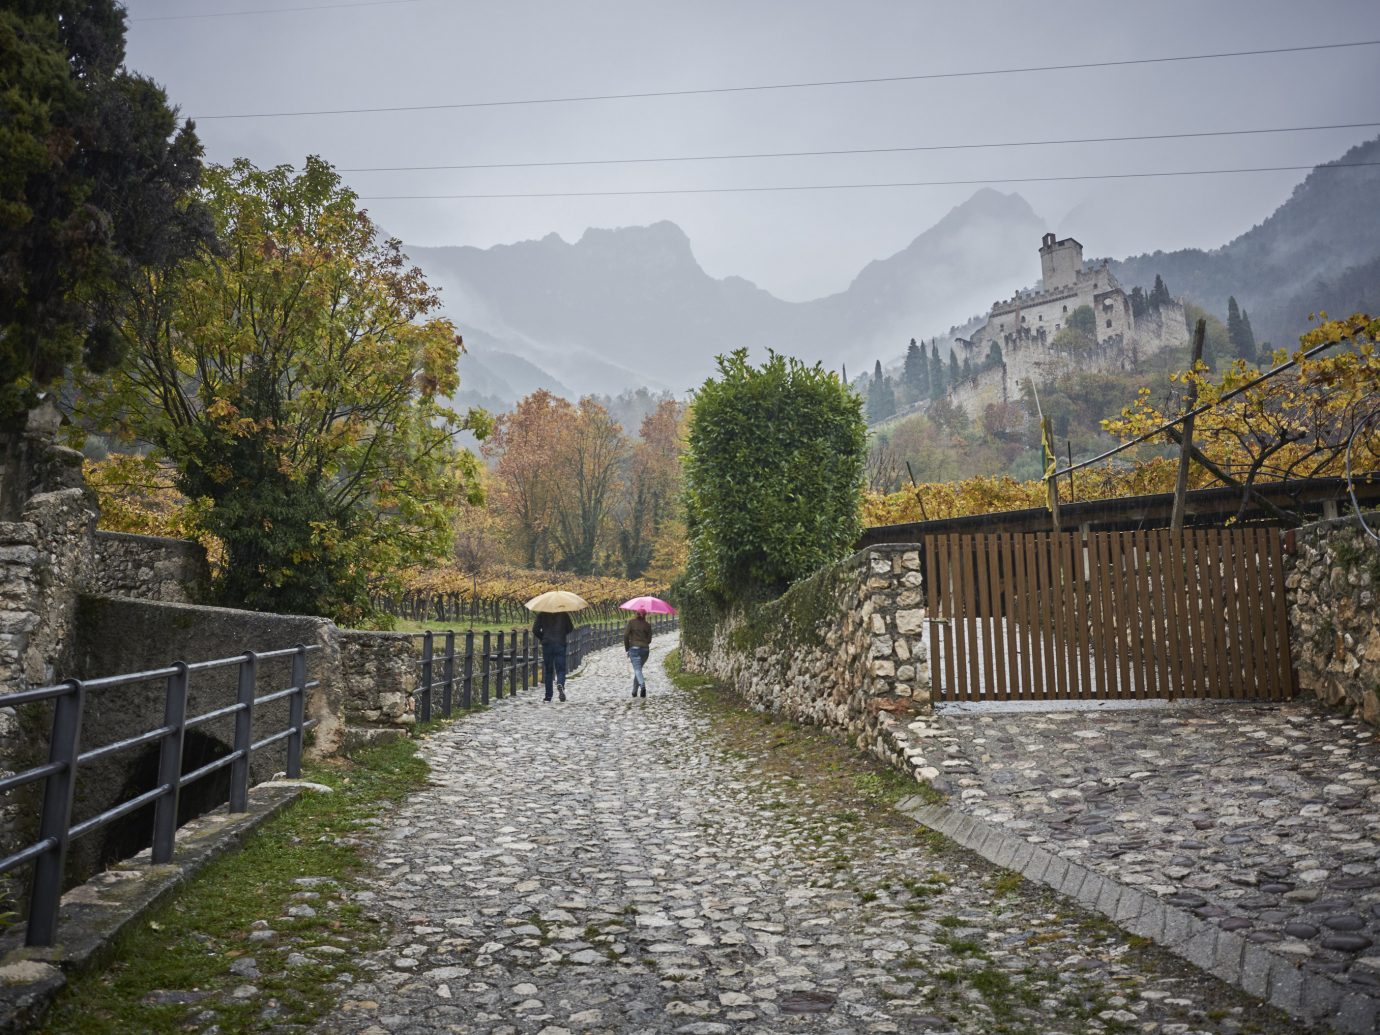 Travel Tips outdoor tree transport wall River waterway Canal way bridge rural area walkway autumn